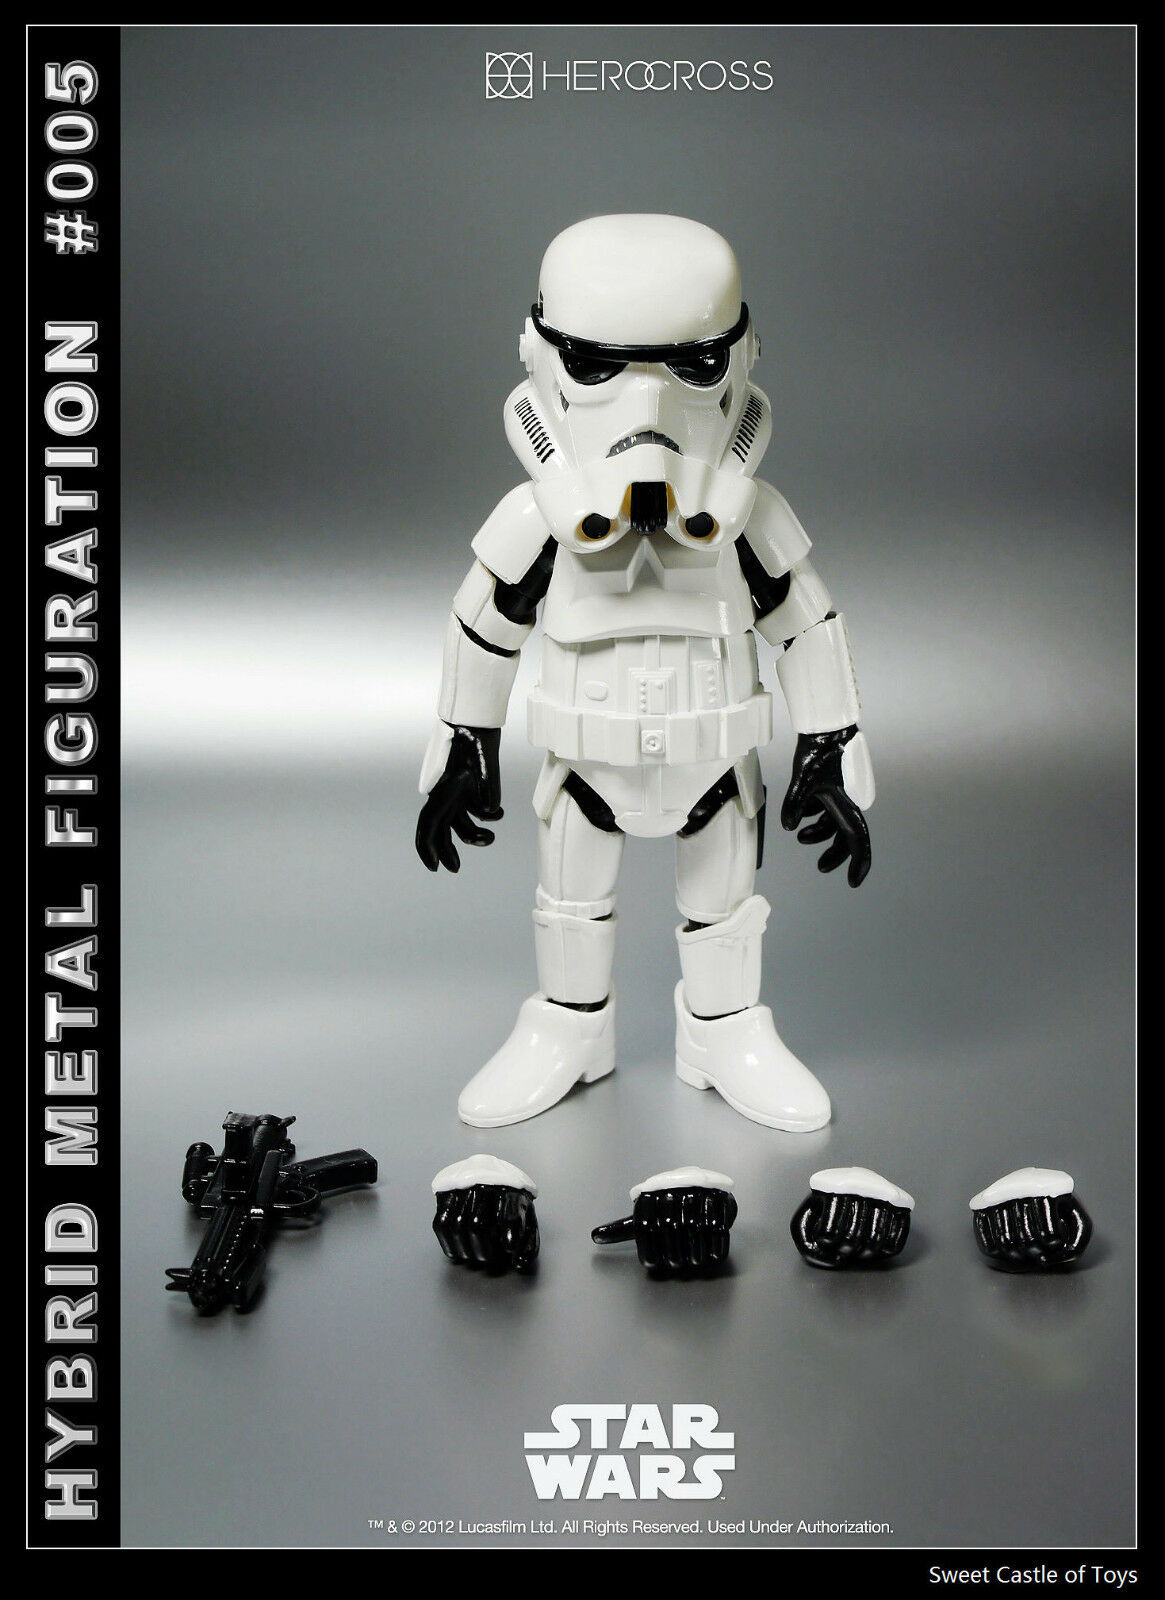 86 Hero HEROCROSS - 14cm Hybrid Metall Star Wars Figuration HMF 005 Stormtrooper